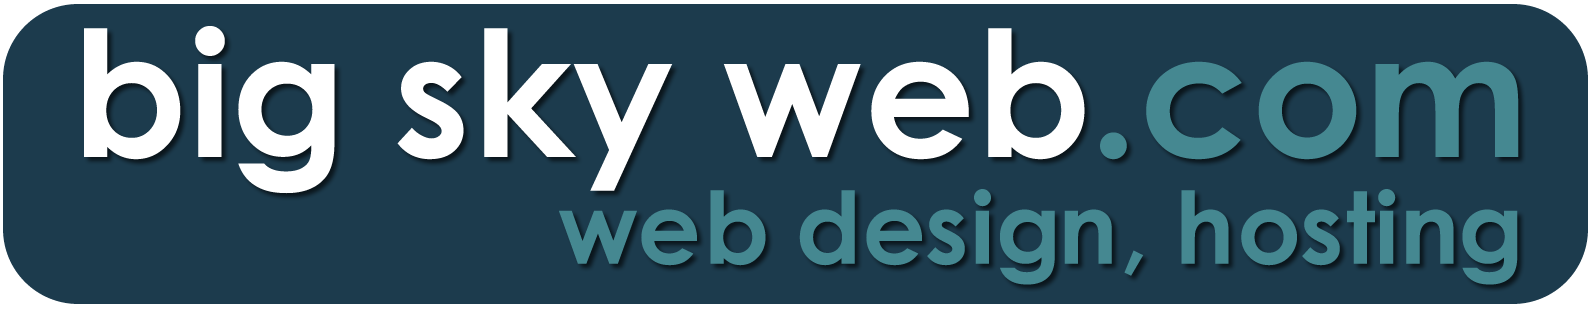 Big Sky Web